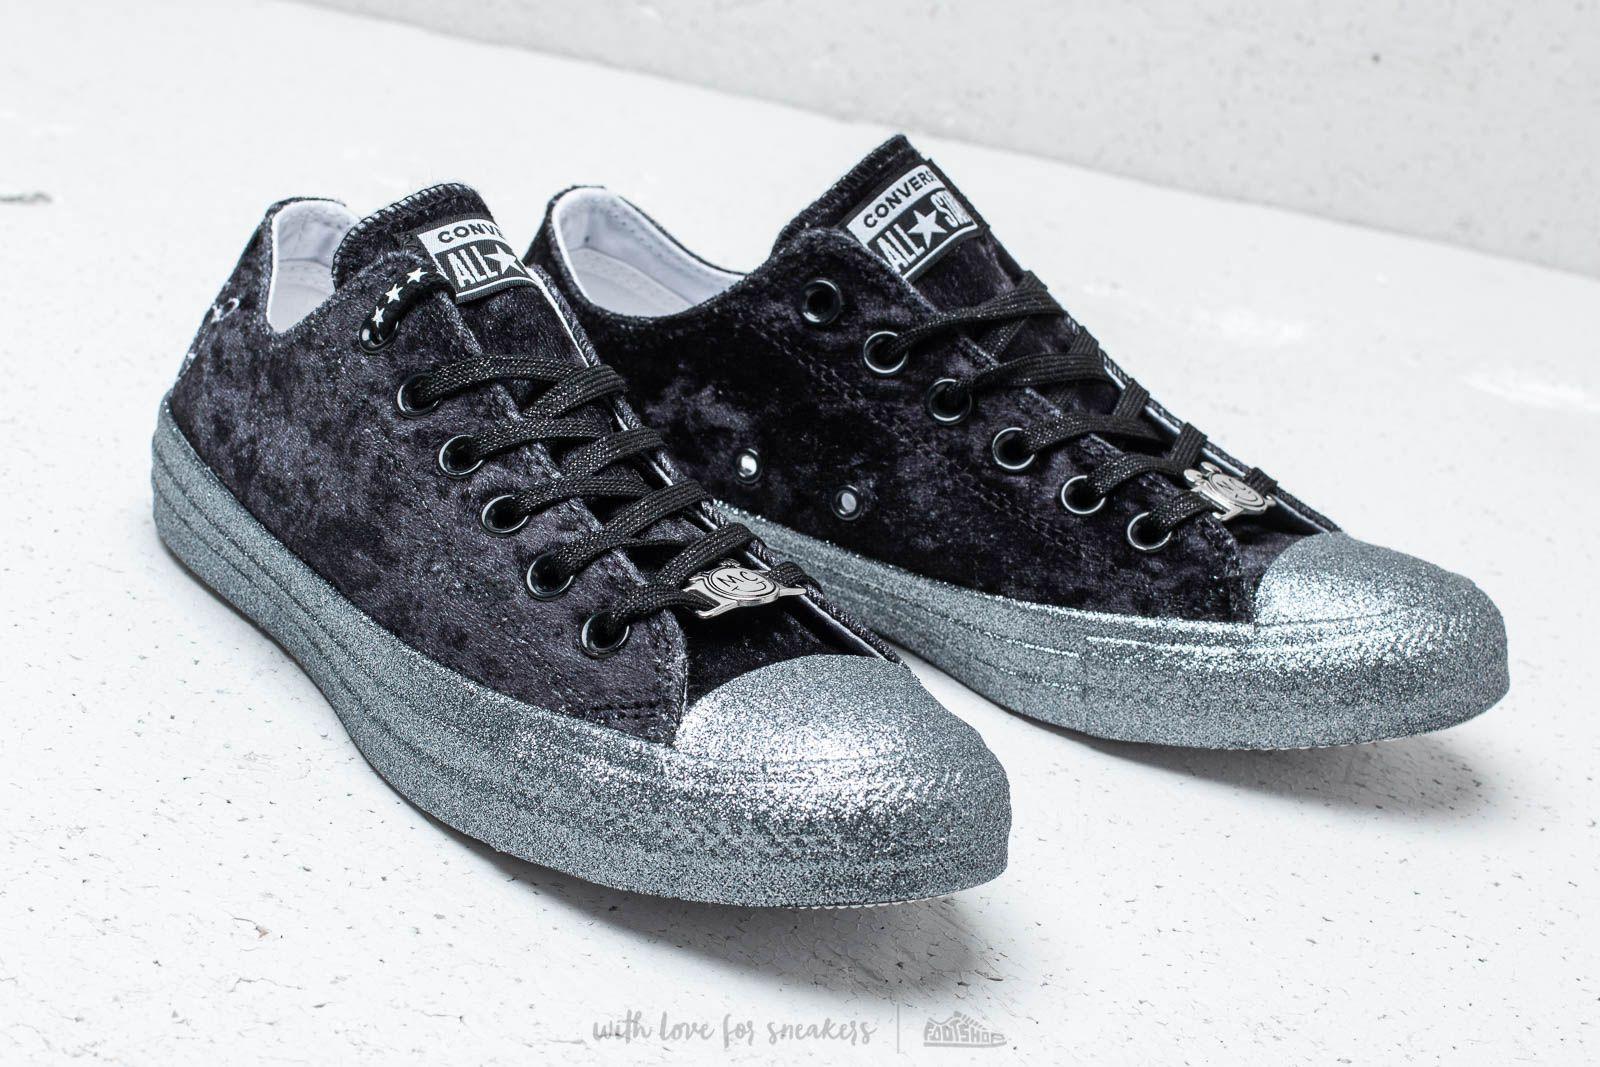 Converse x Miley Cyrus Chuck Taylor All Star Ox Black Silver White | Footshop